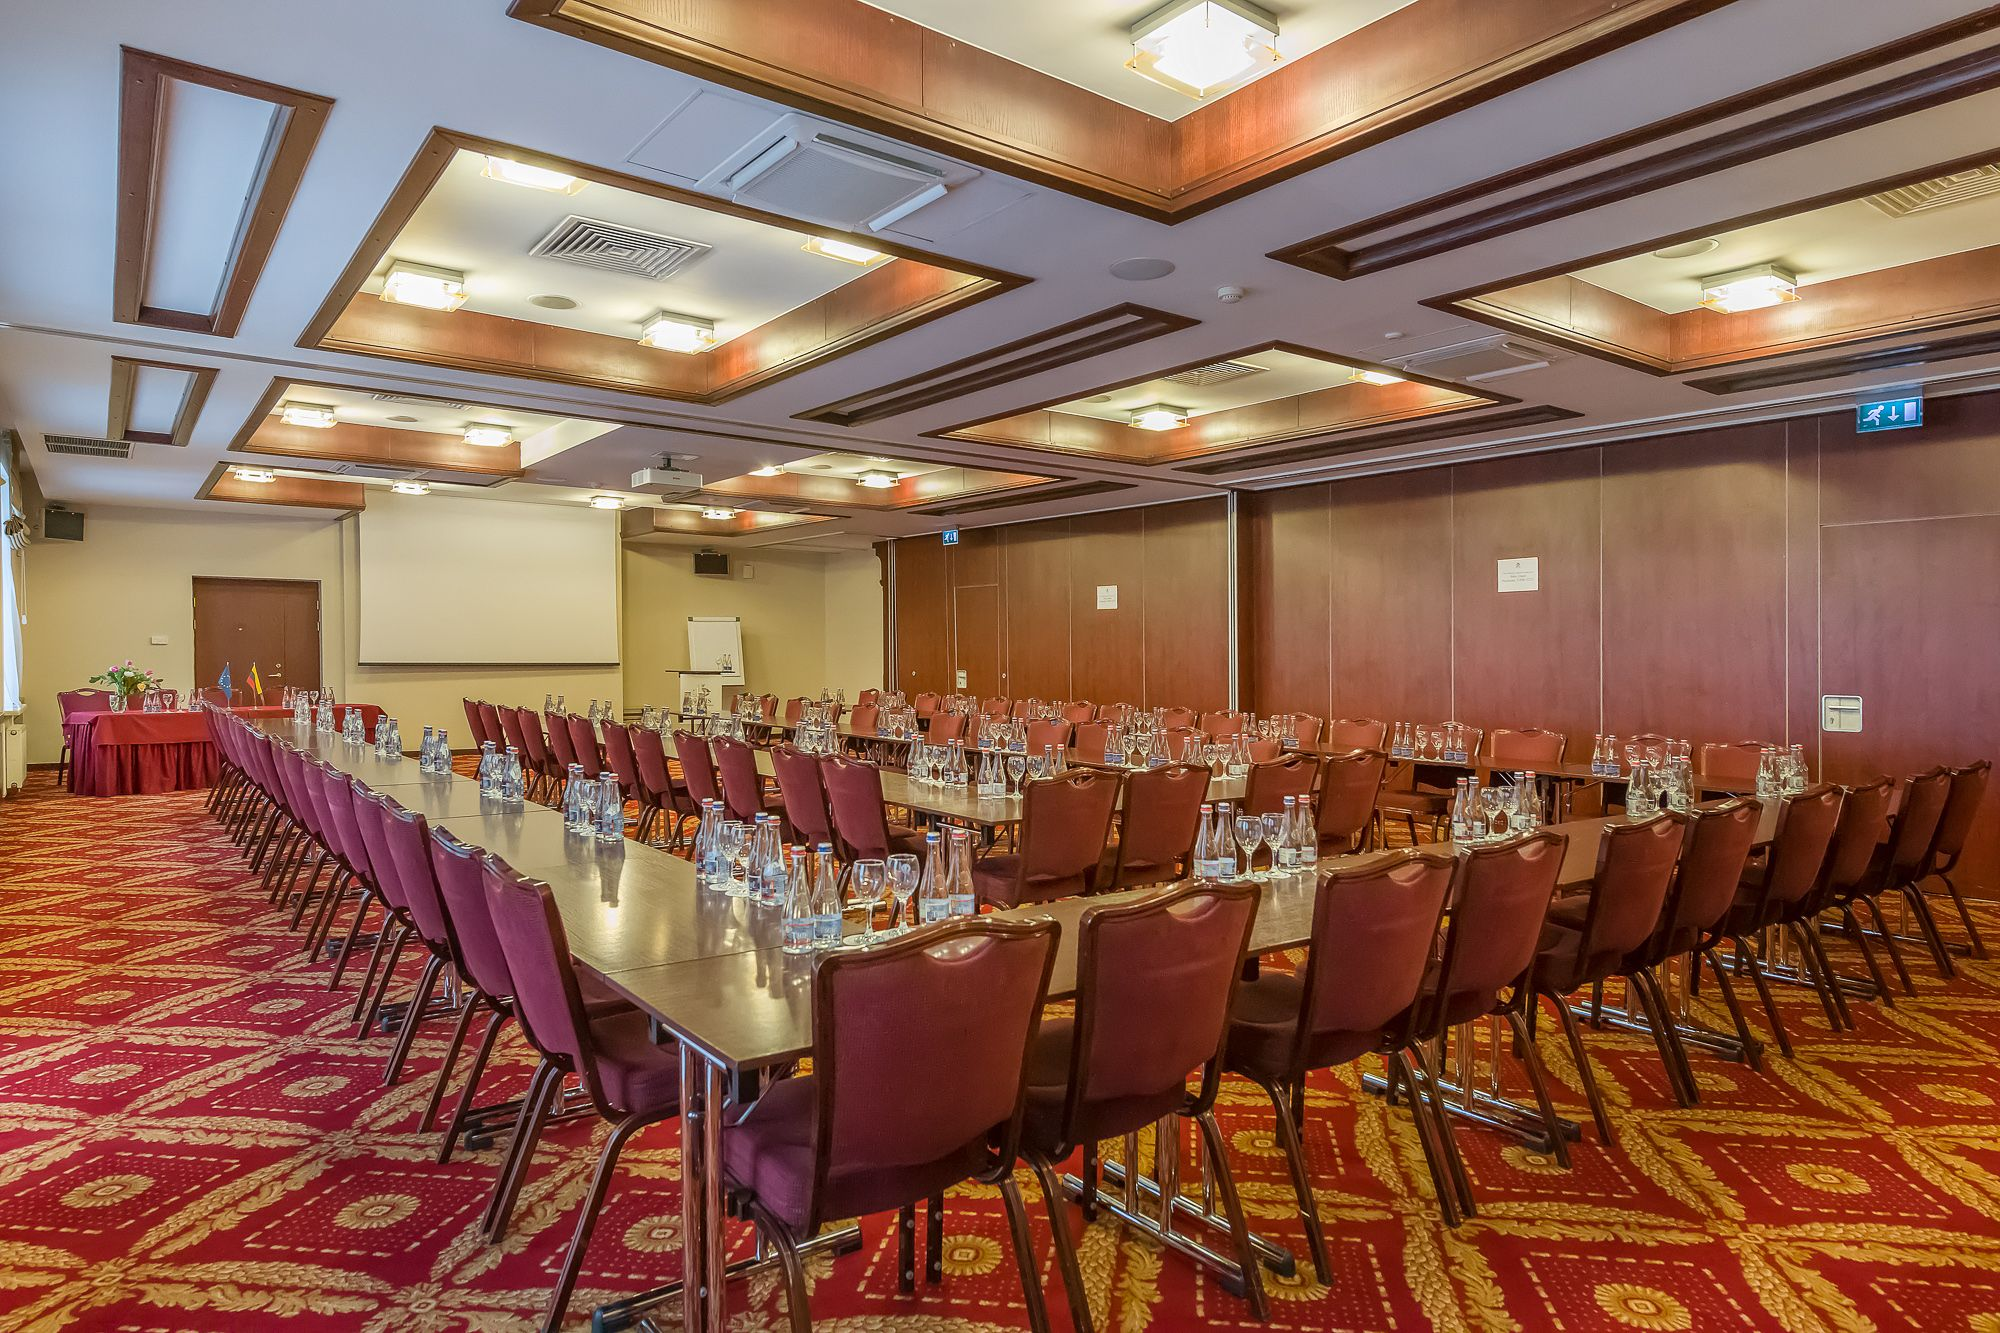 Artis Centrum Hotels Conference Room - Aida